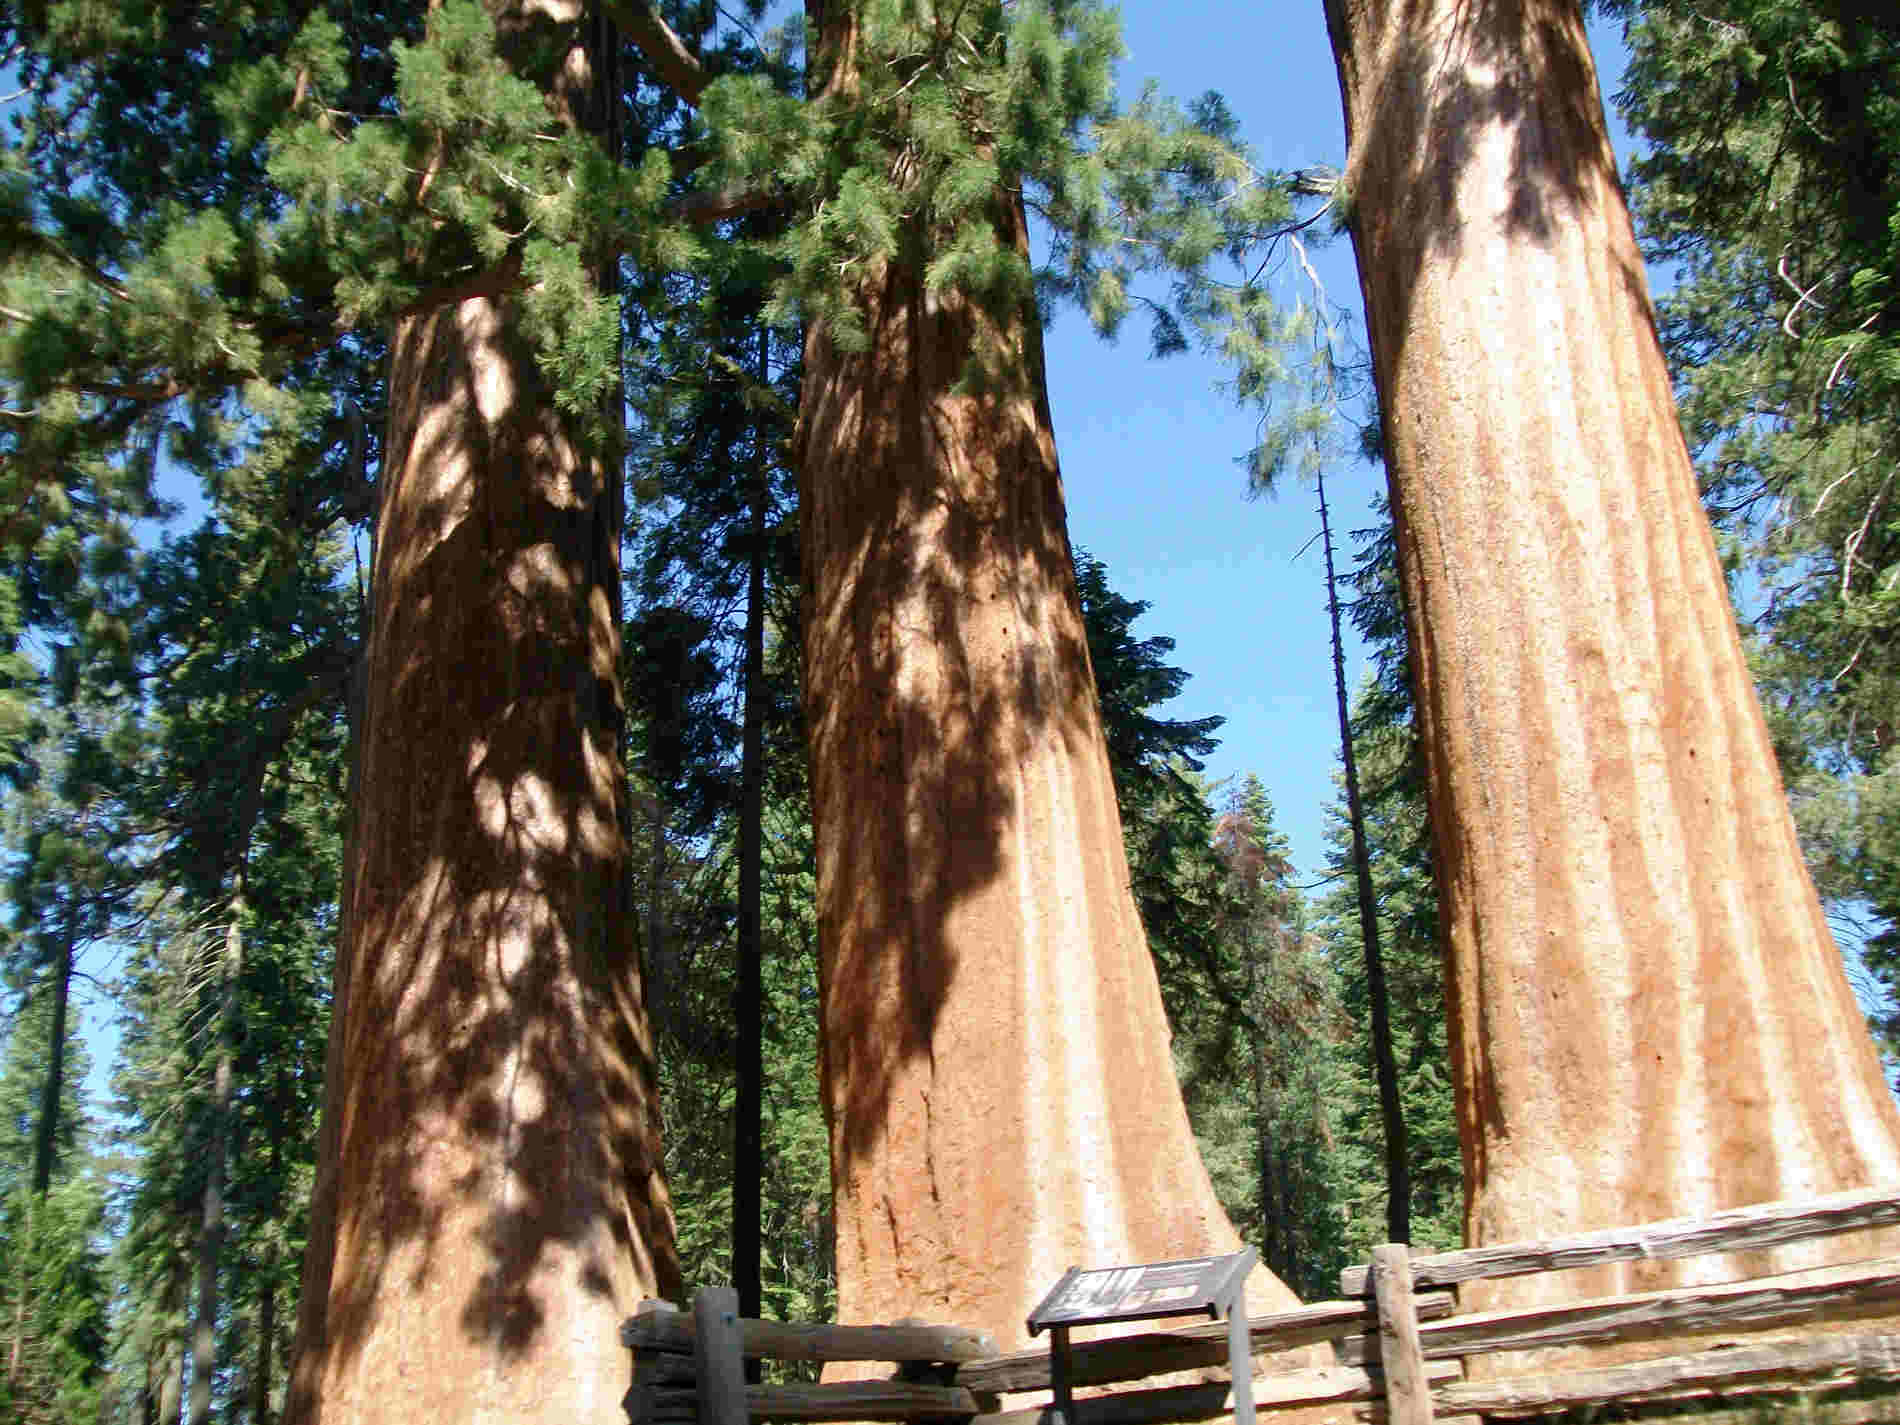 Sequoie nei Parchi Nazionali Ovest U.S.A.